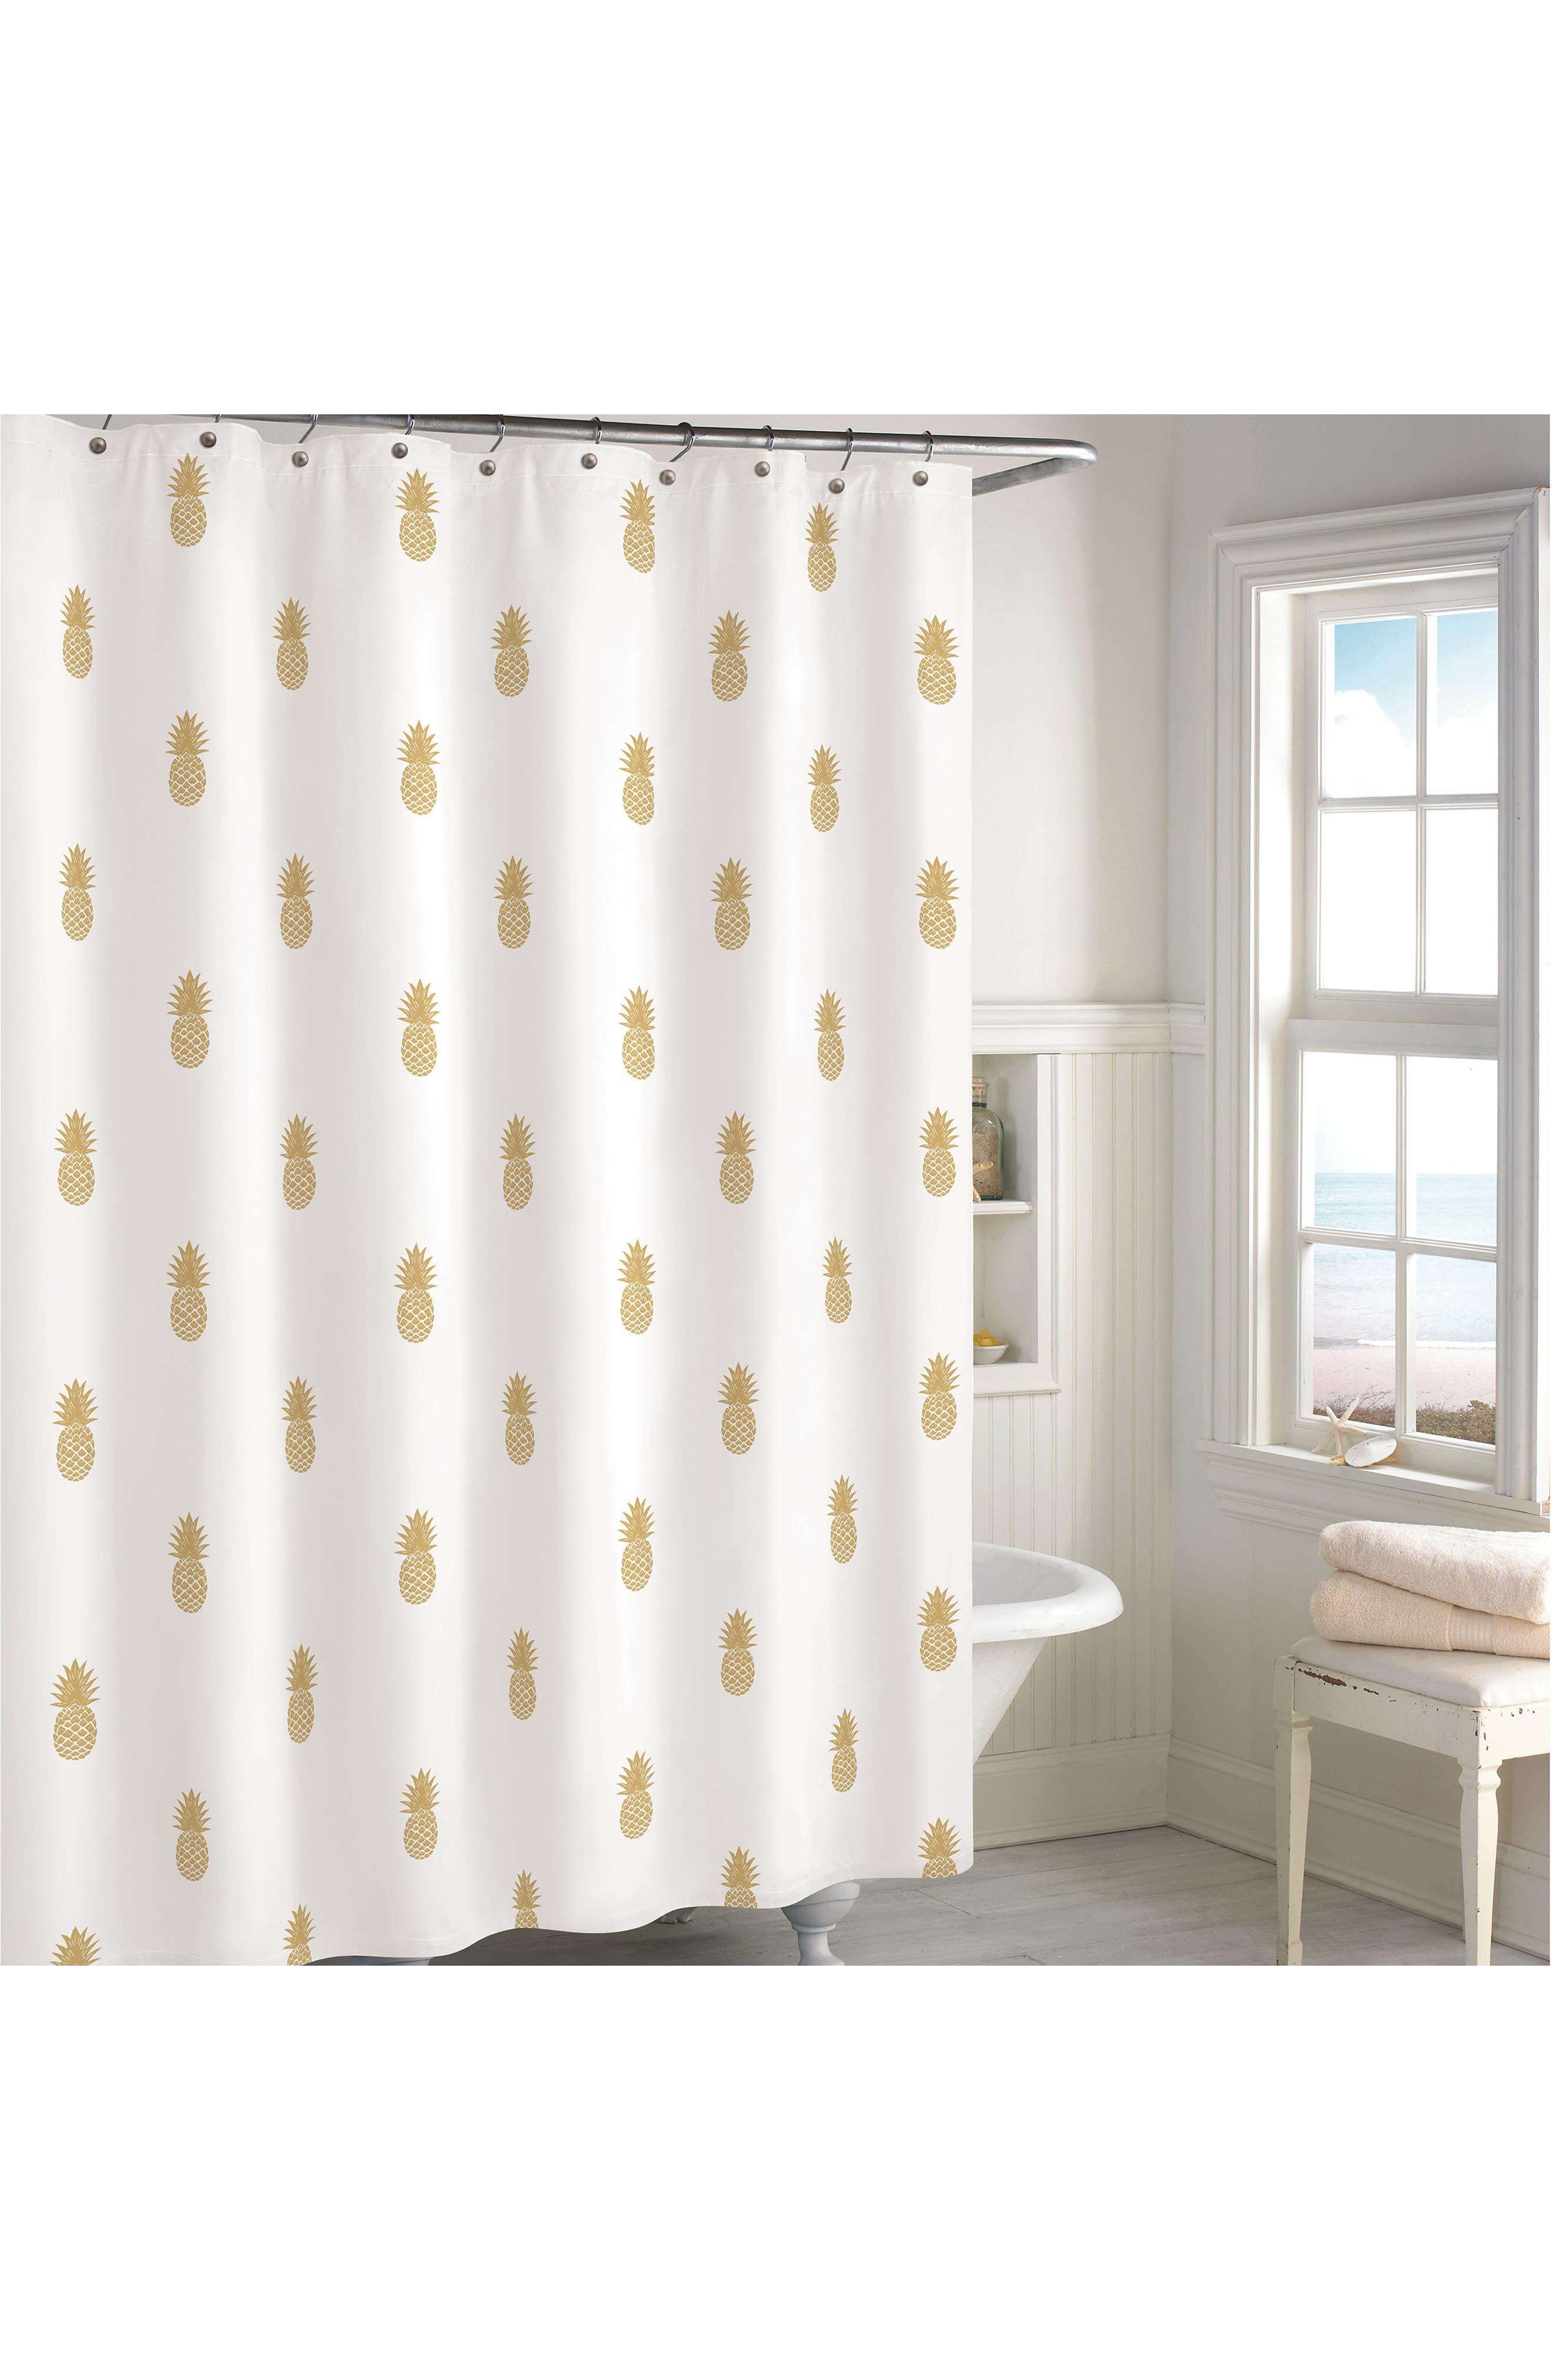 Alternate Image 1 Selected - Destinations Golden Pineapple Shower Curtain